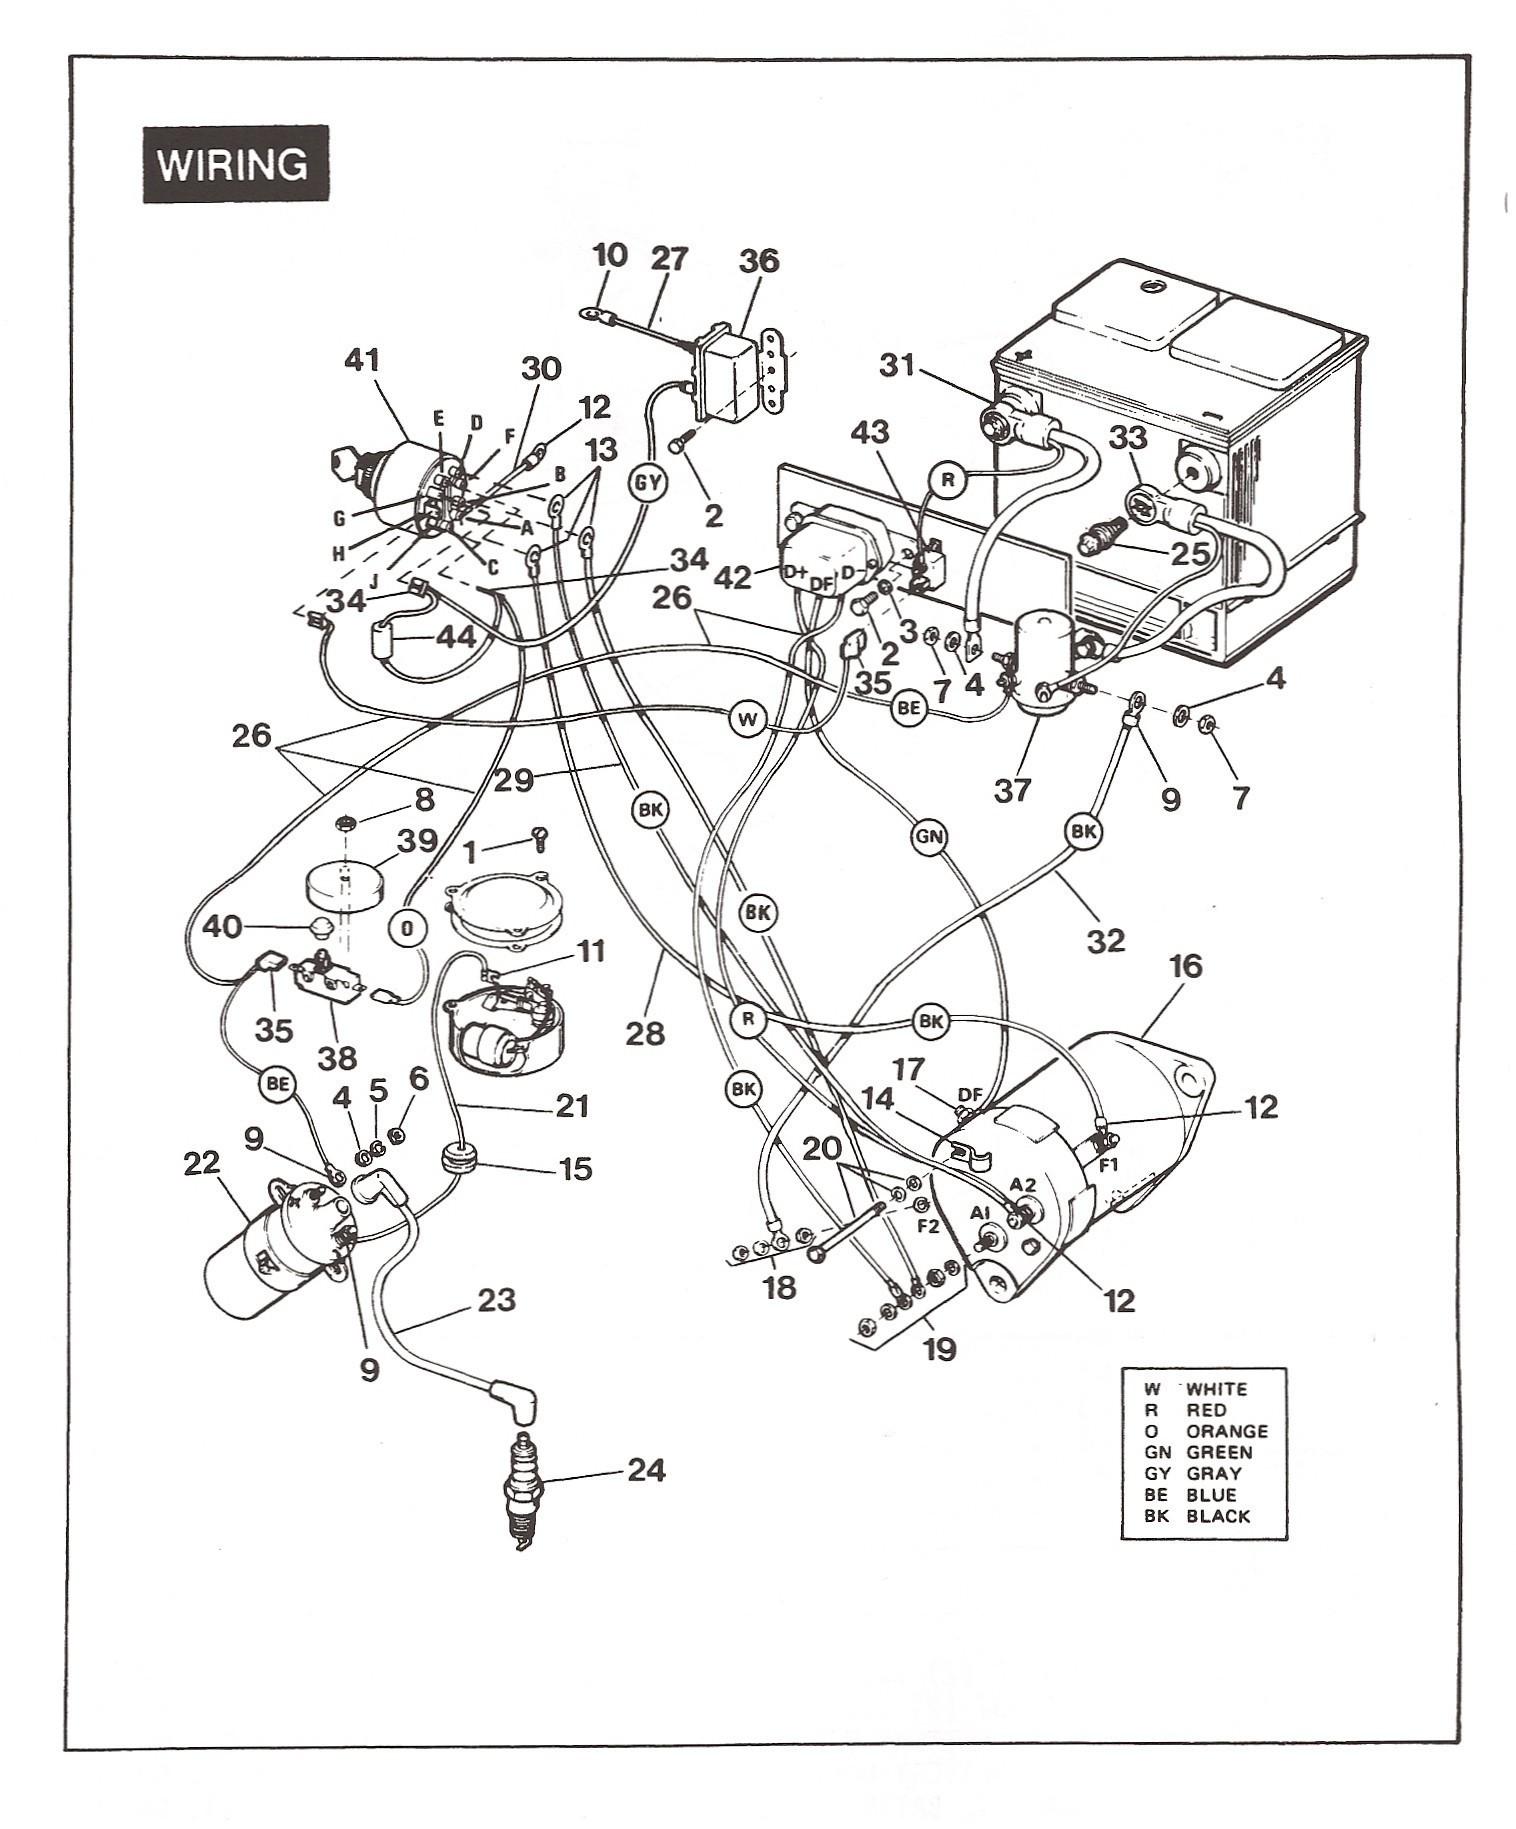 Ezgo Golf Cart Wiring Diagram New 98 Ez Go Wiring Diagram 2018 Wiring Diagram Ezgo Electric